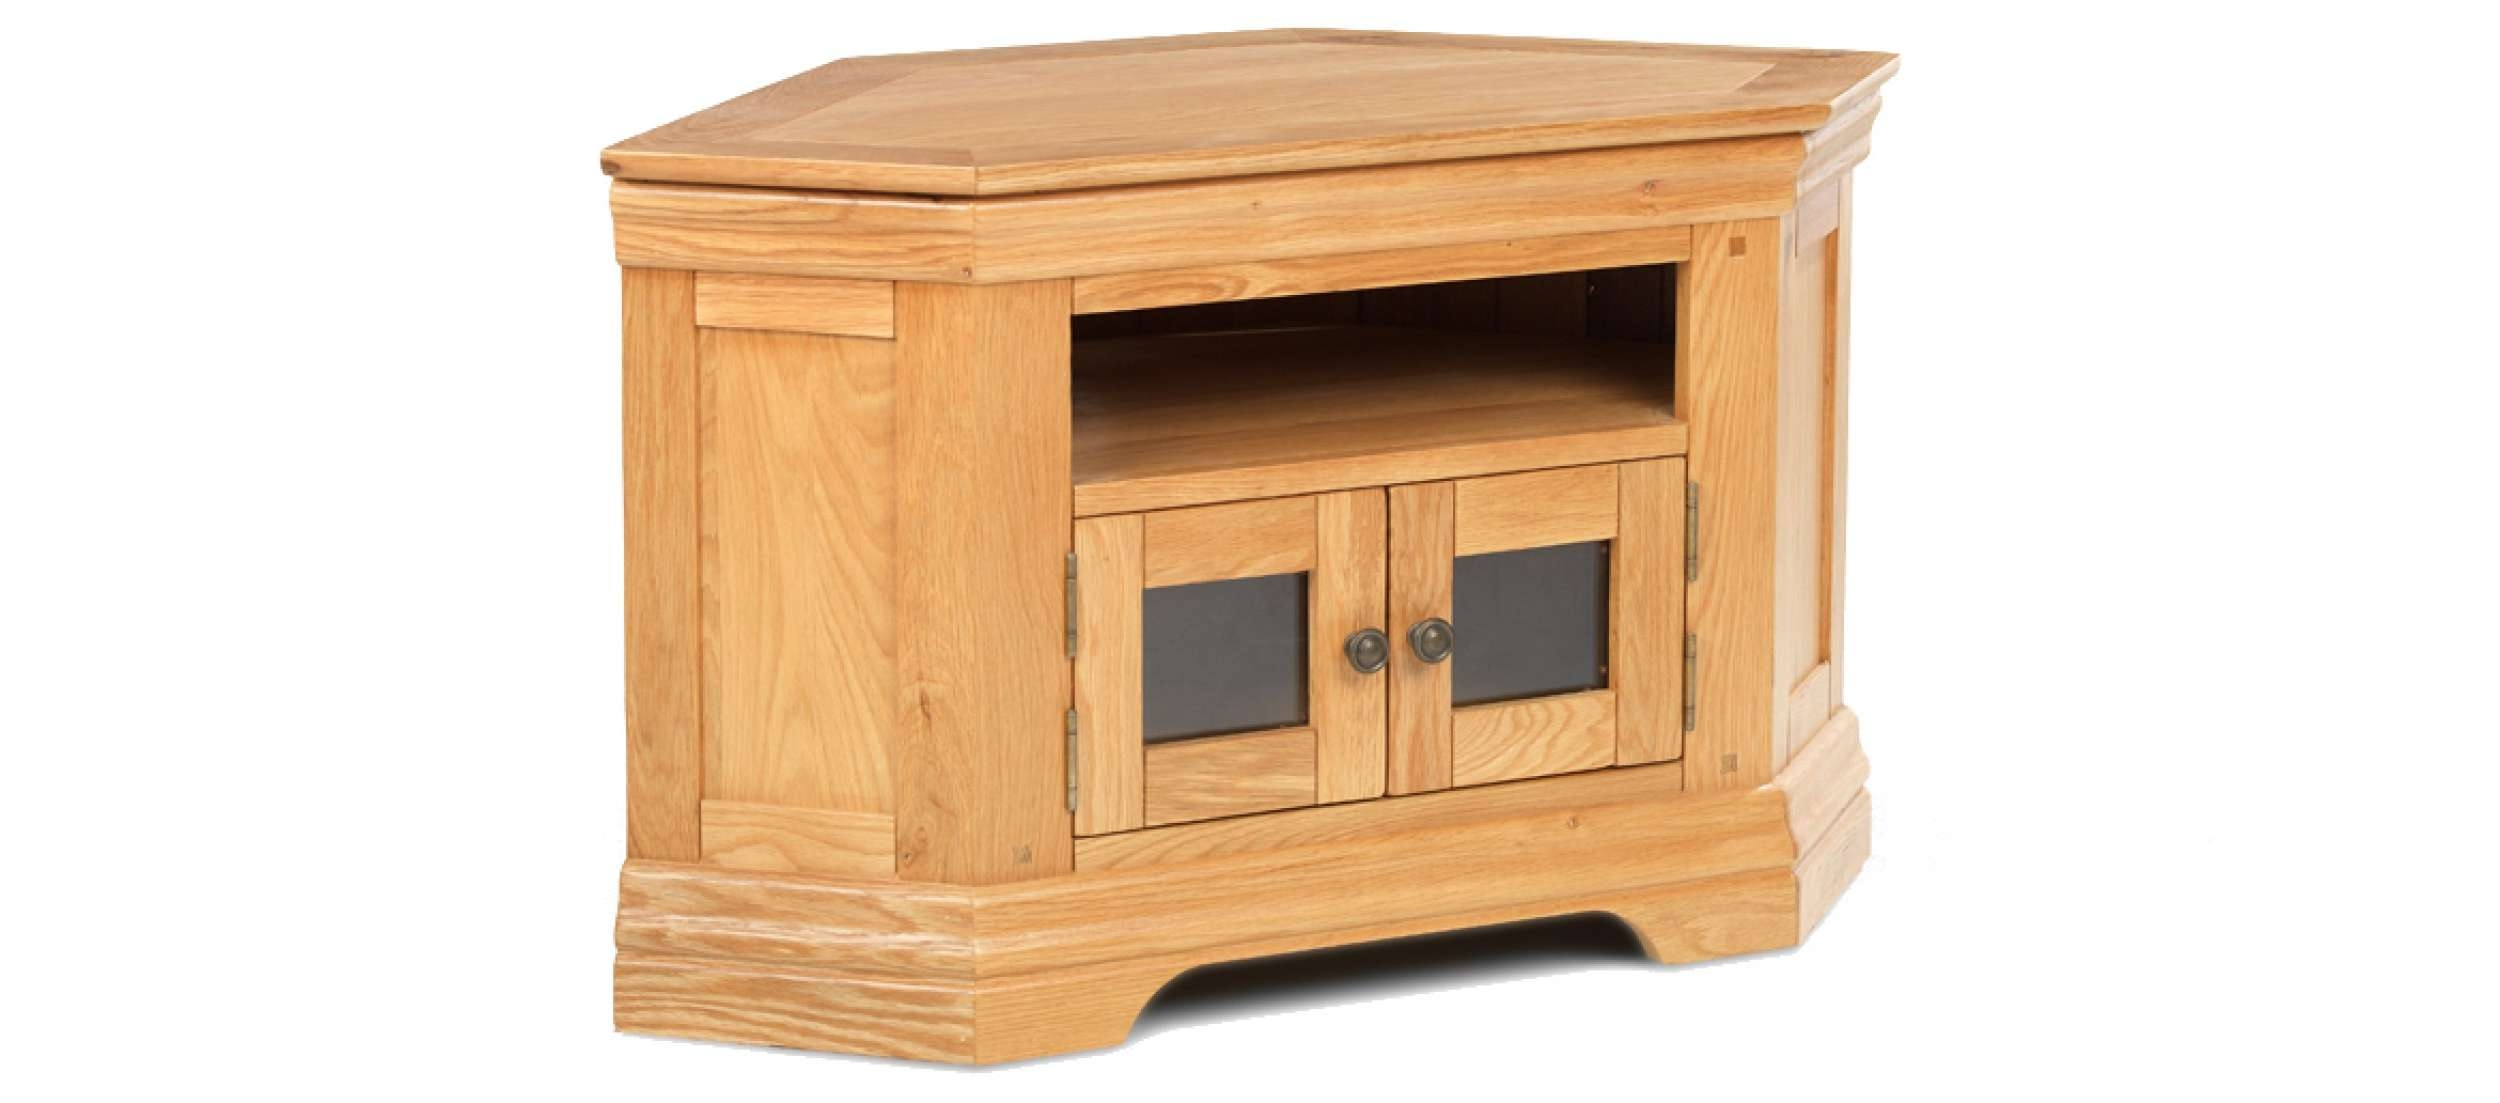 Constance Oak Corner Tv Cabinet | Quercus Living Inside Oak Corner Tv Stands (View 3 of 15)